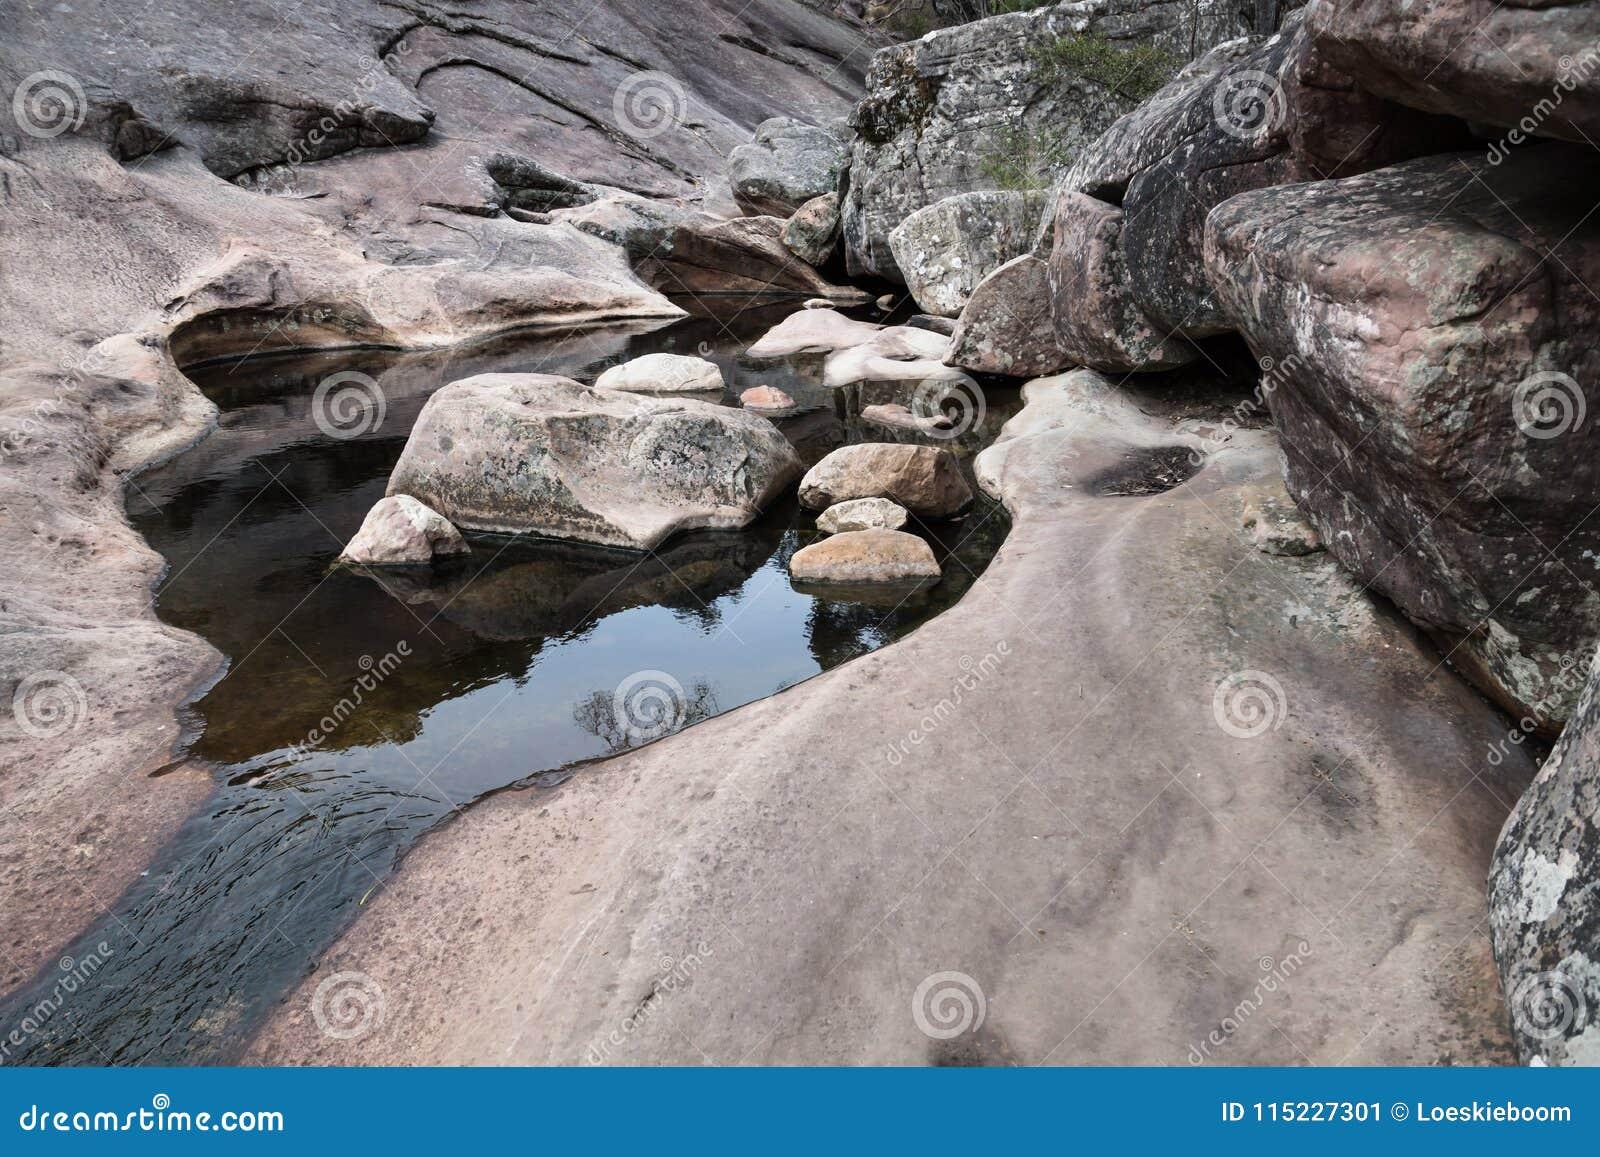 Venus baths, Rock formation shaped by river in Halls Gap, Grampians, Victoria, Australia